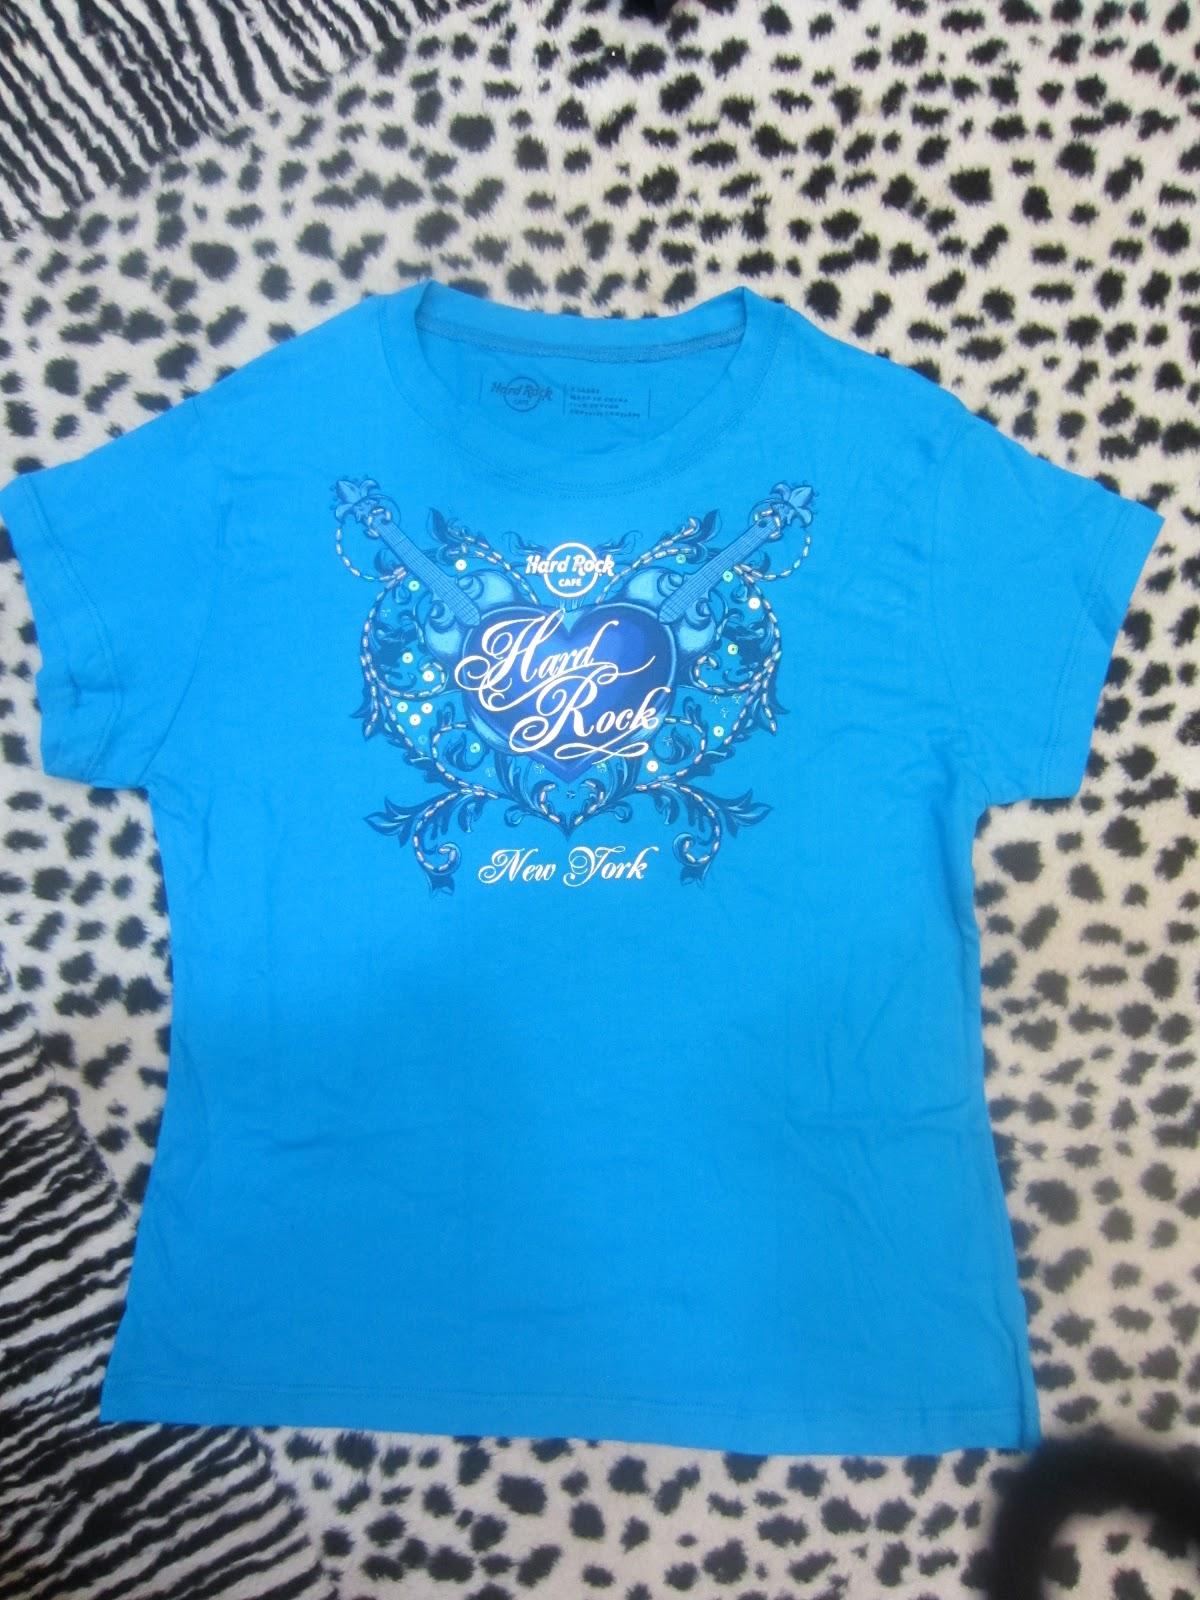 kidz zone     Hard Rock Cafe New York T-shirt 6f84d1299cc